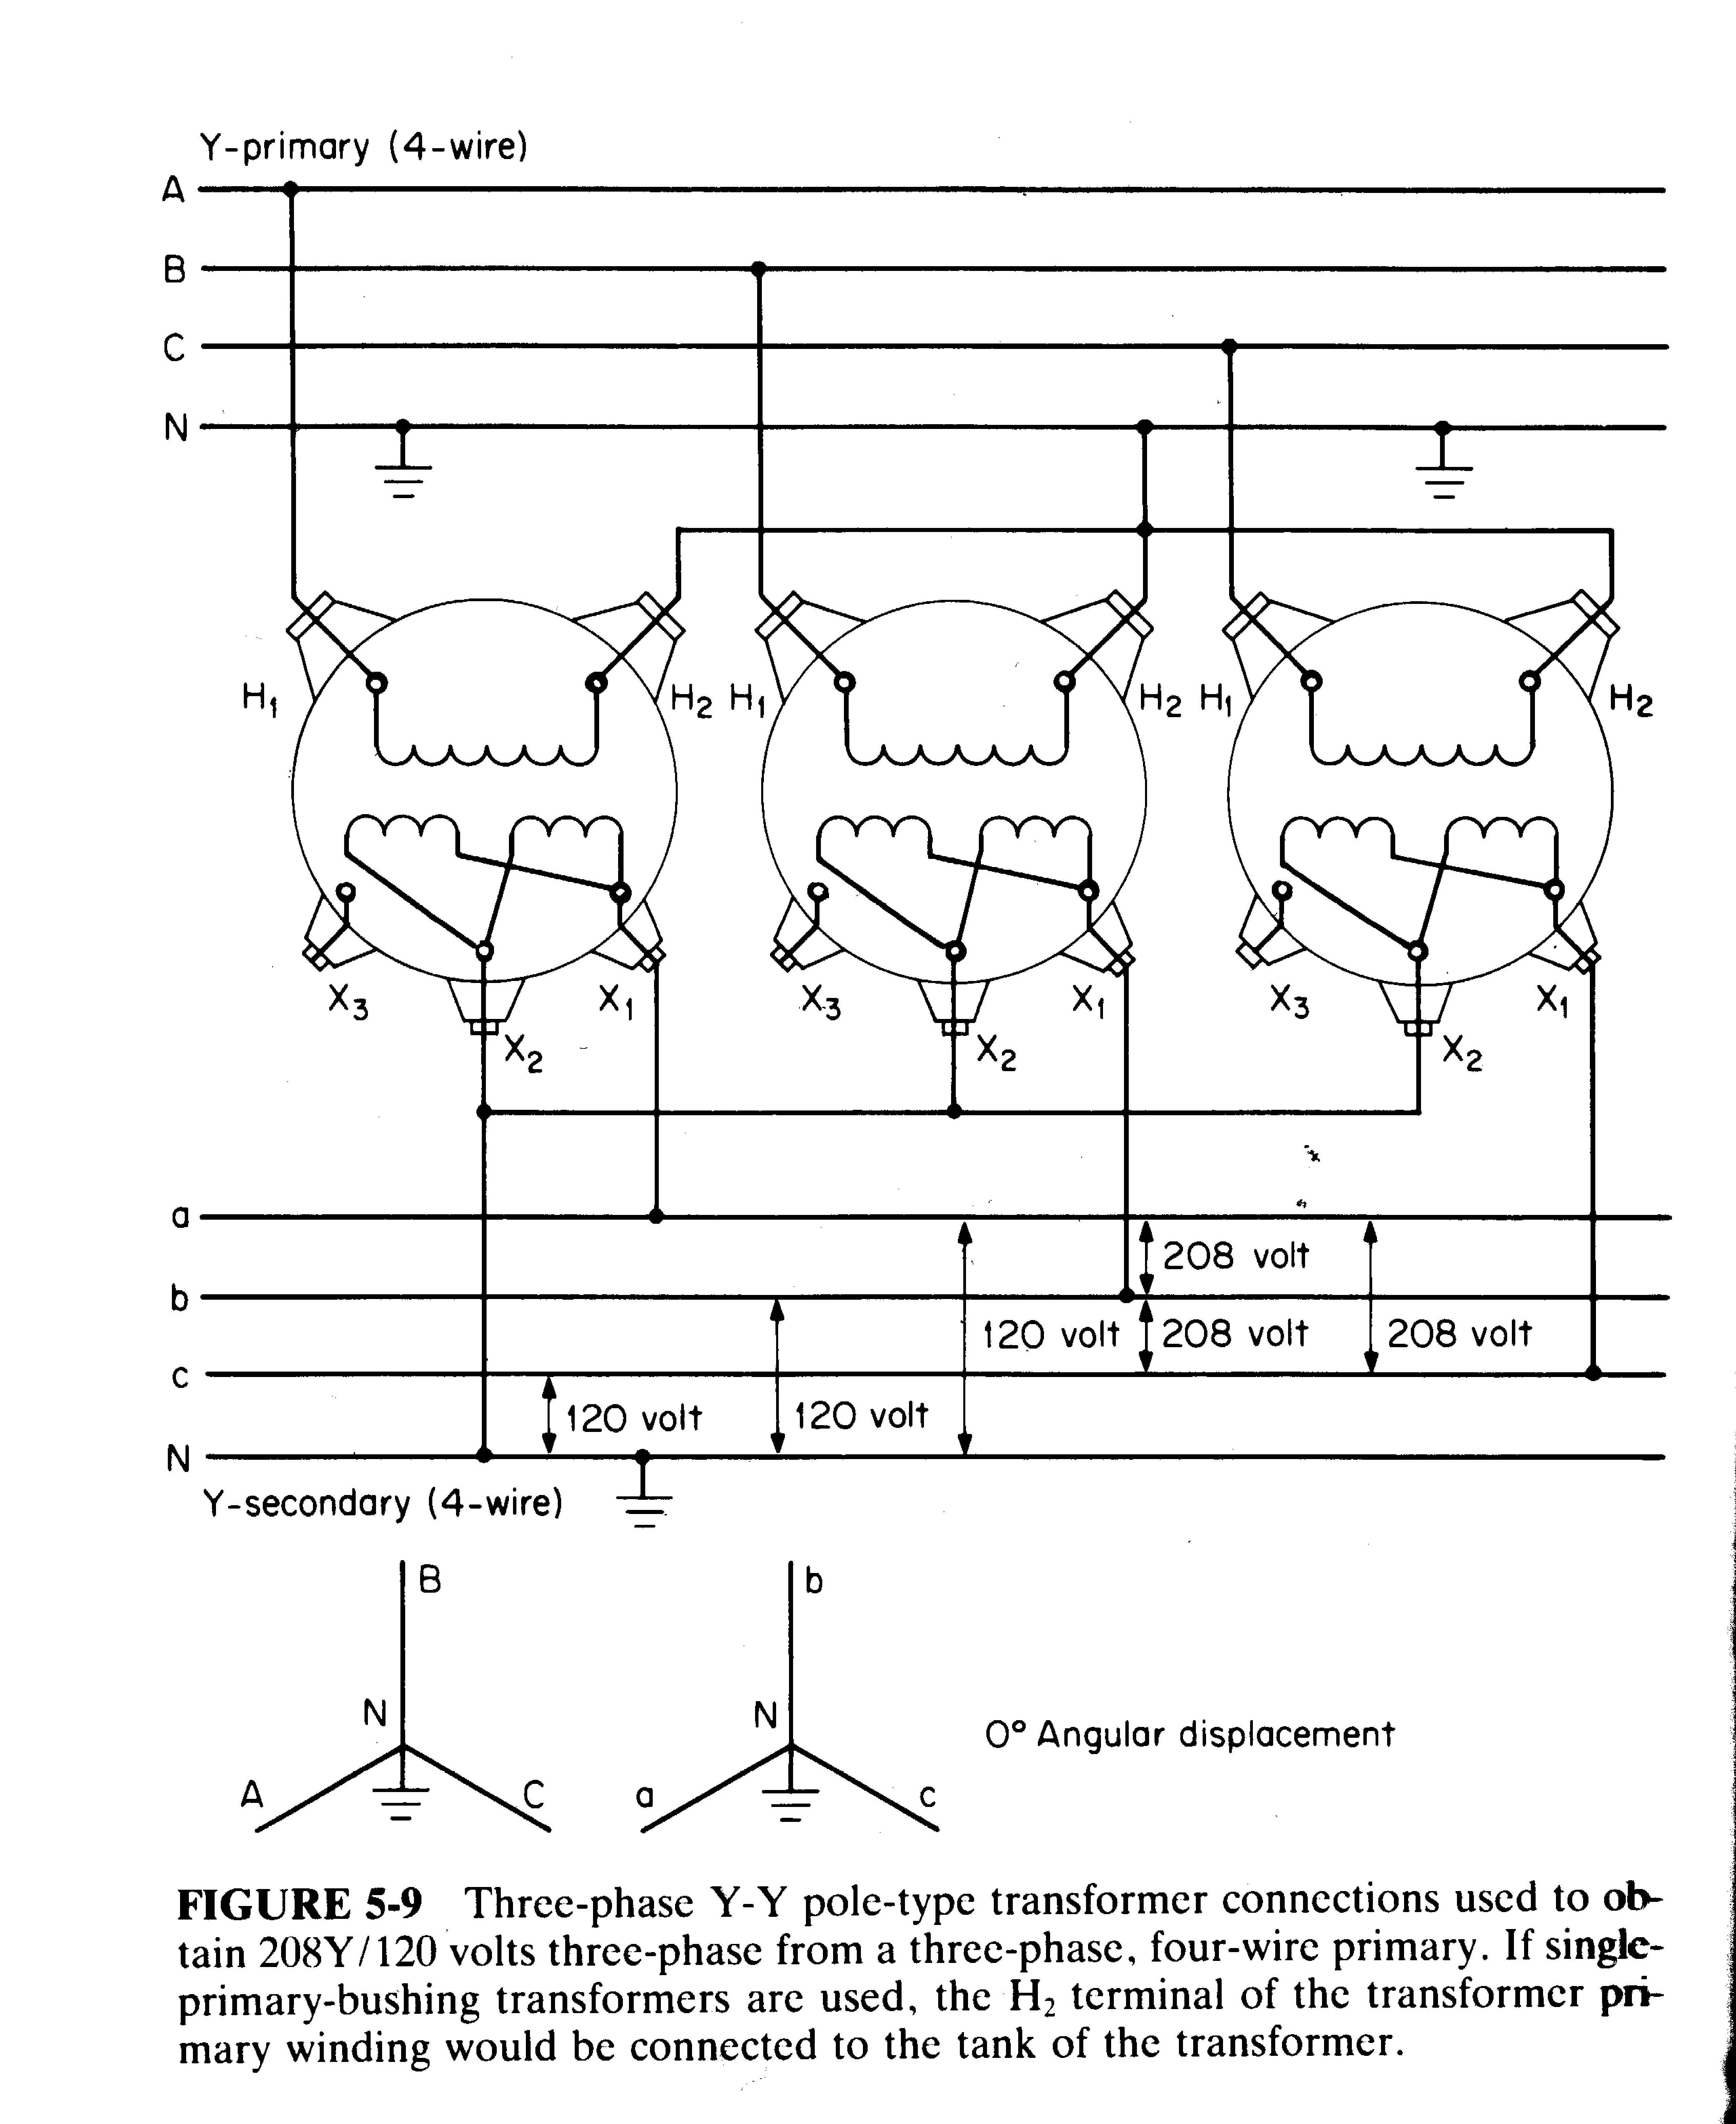 3 Phase Wire Diagram 480v 3 Phase Delta Transformer Wiring Diagram